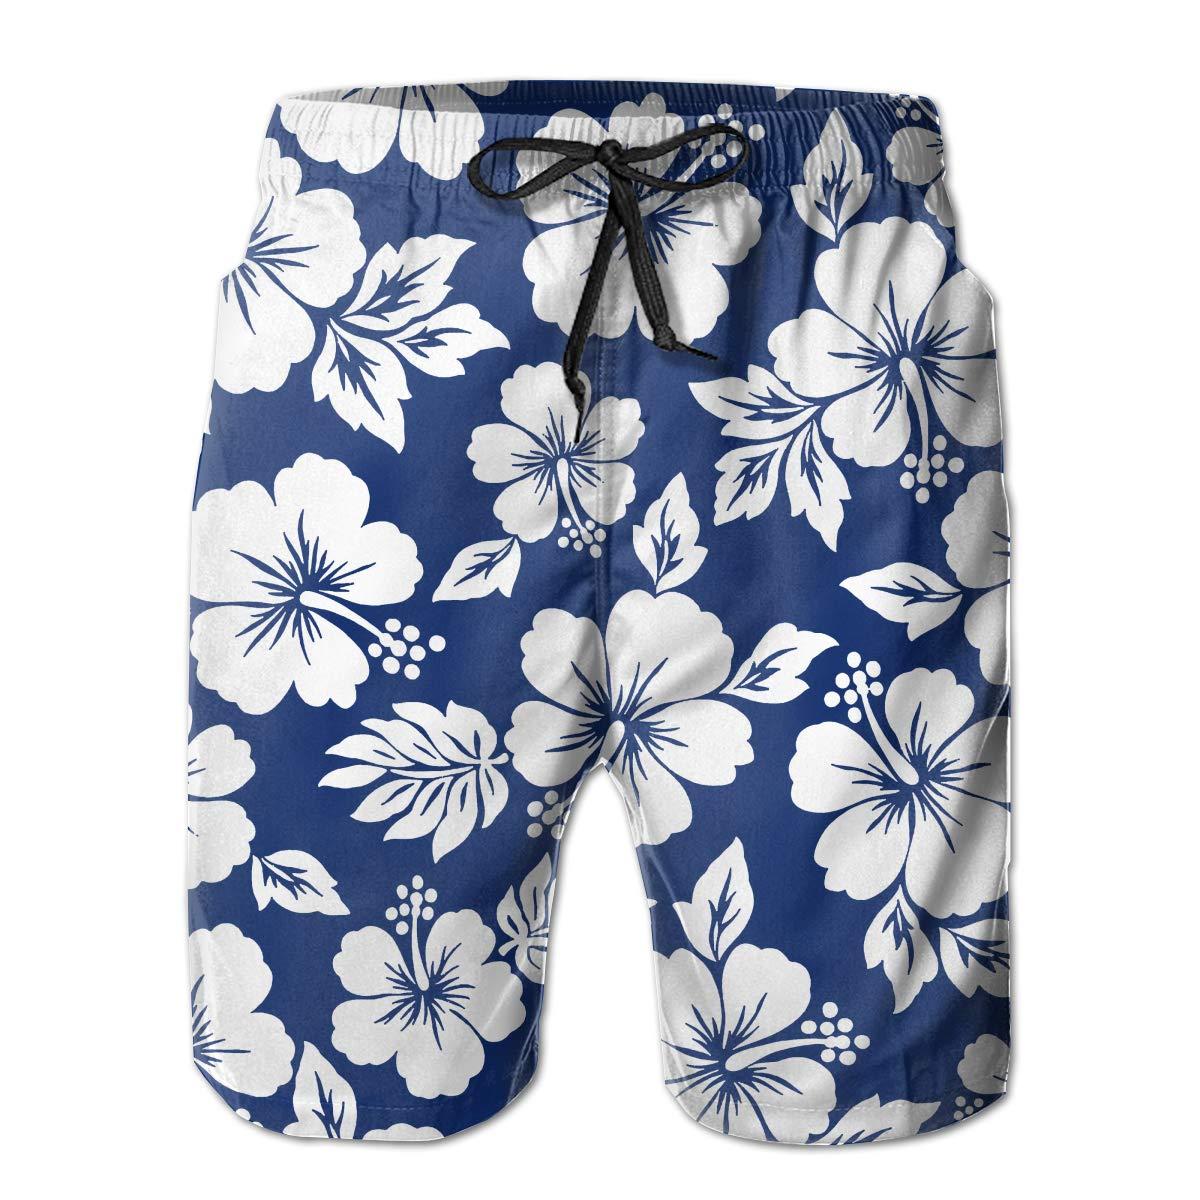 HHHDAM Blue Hibiscus Flower Mens Swim Trunks Board Beachwear Casual Beach Shorts for Men with Mesh Lining